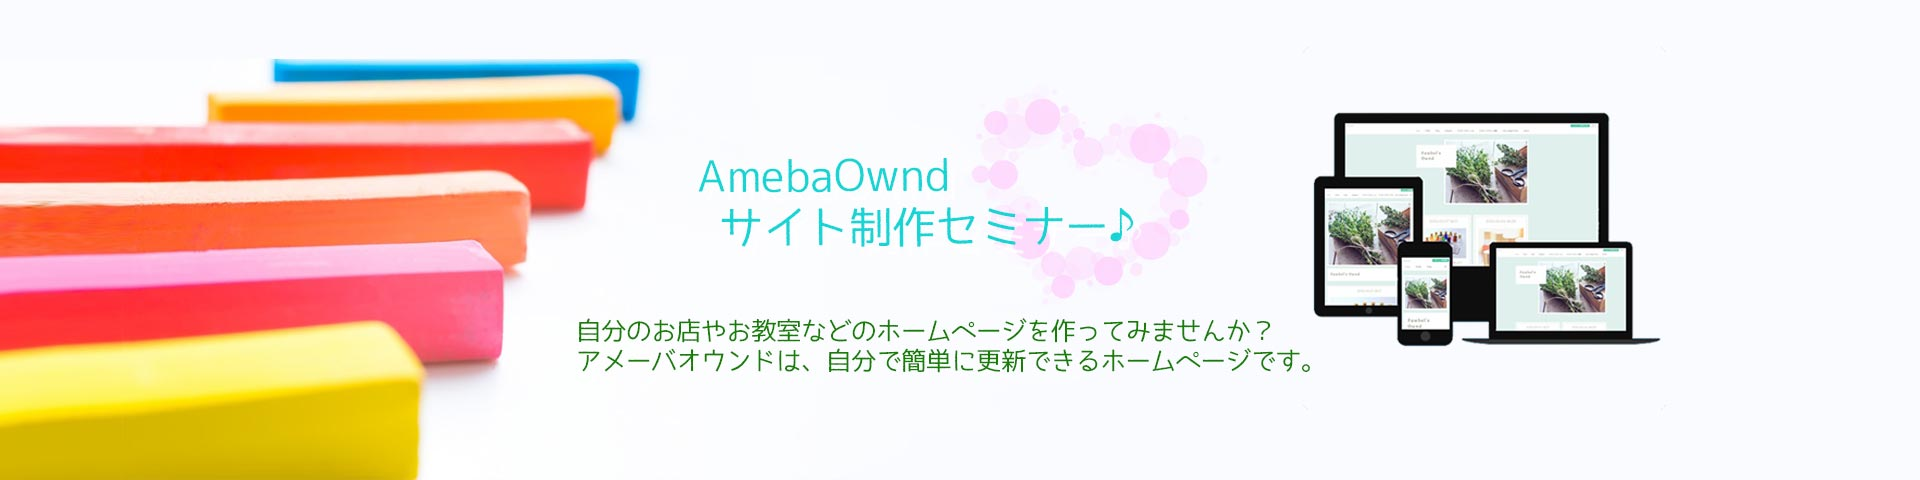 AmebaOwndサイト制作セミナー